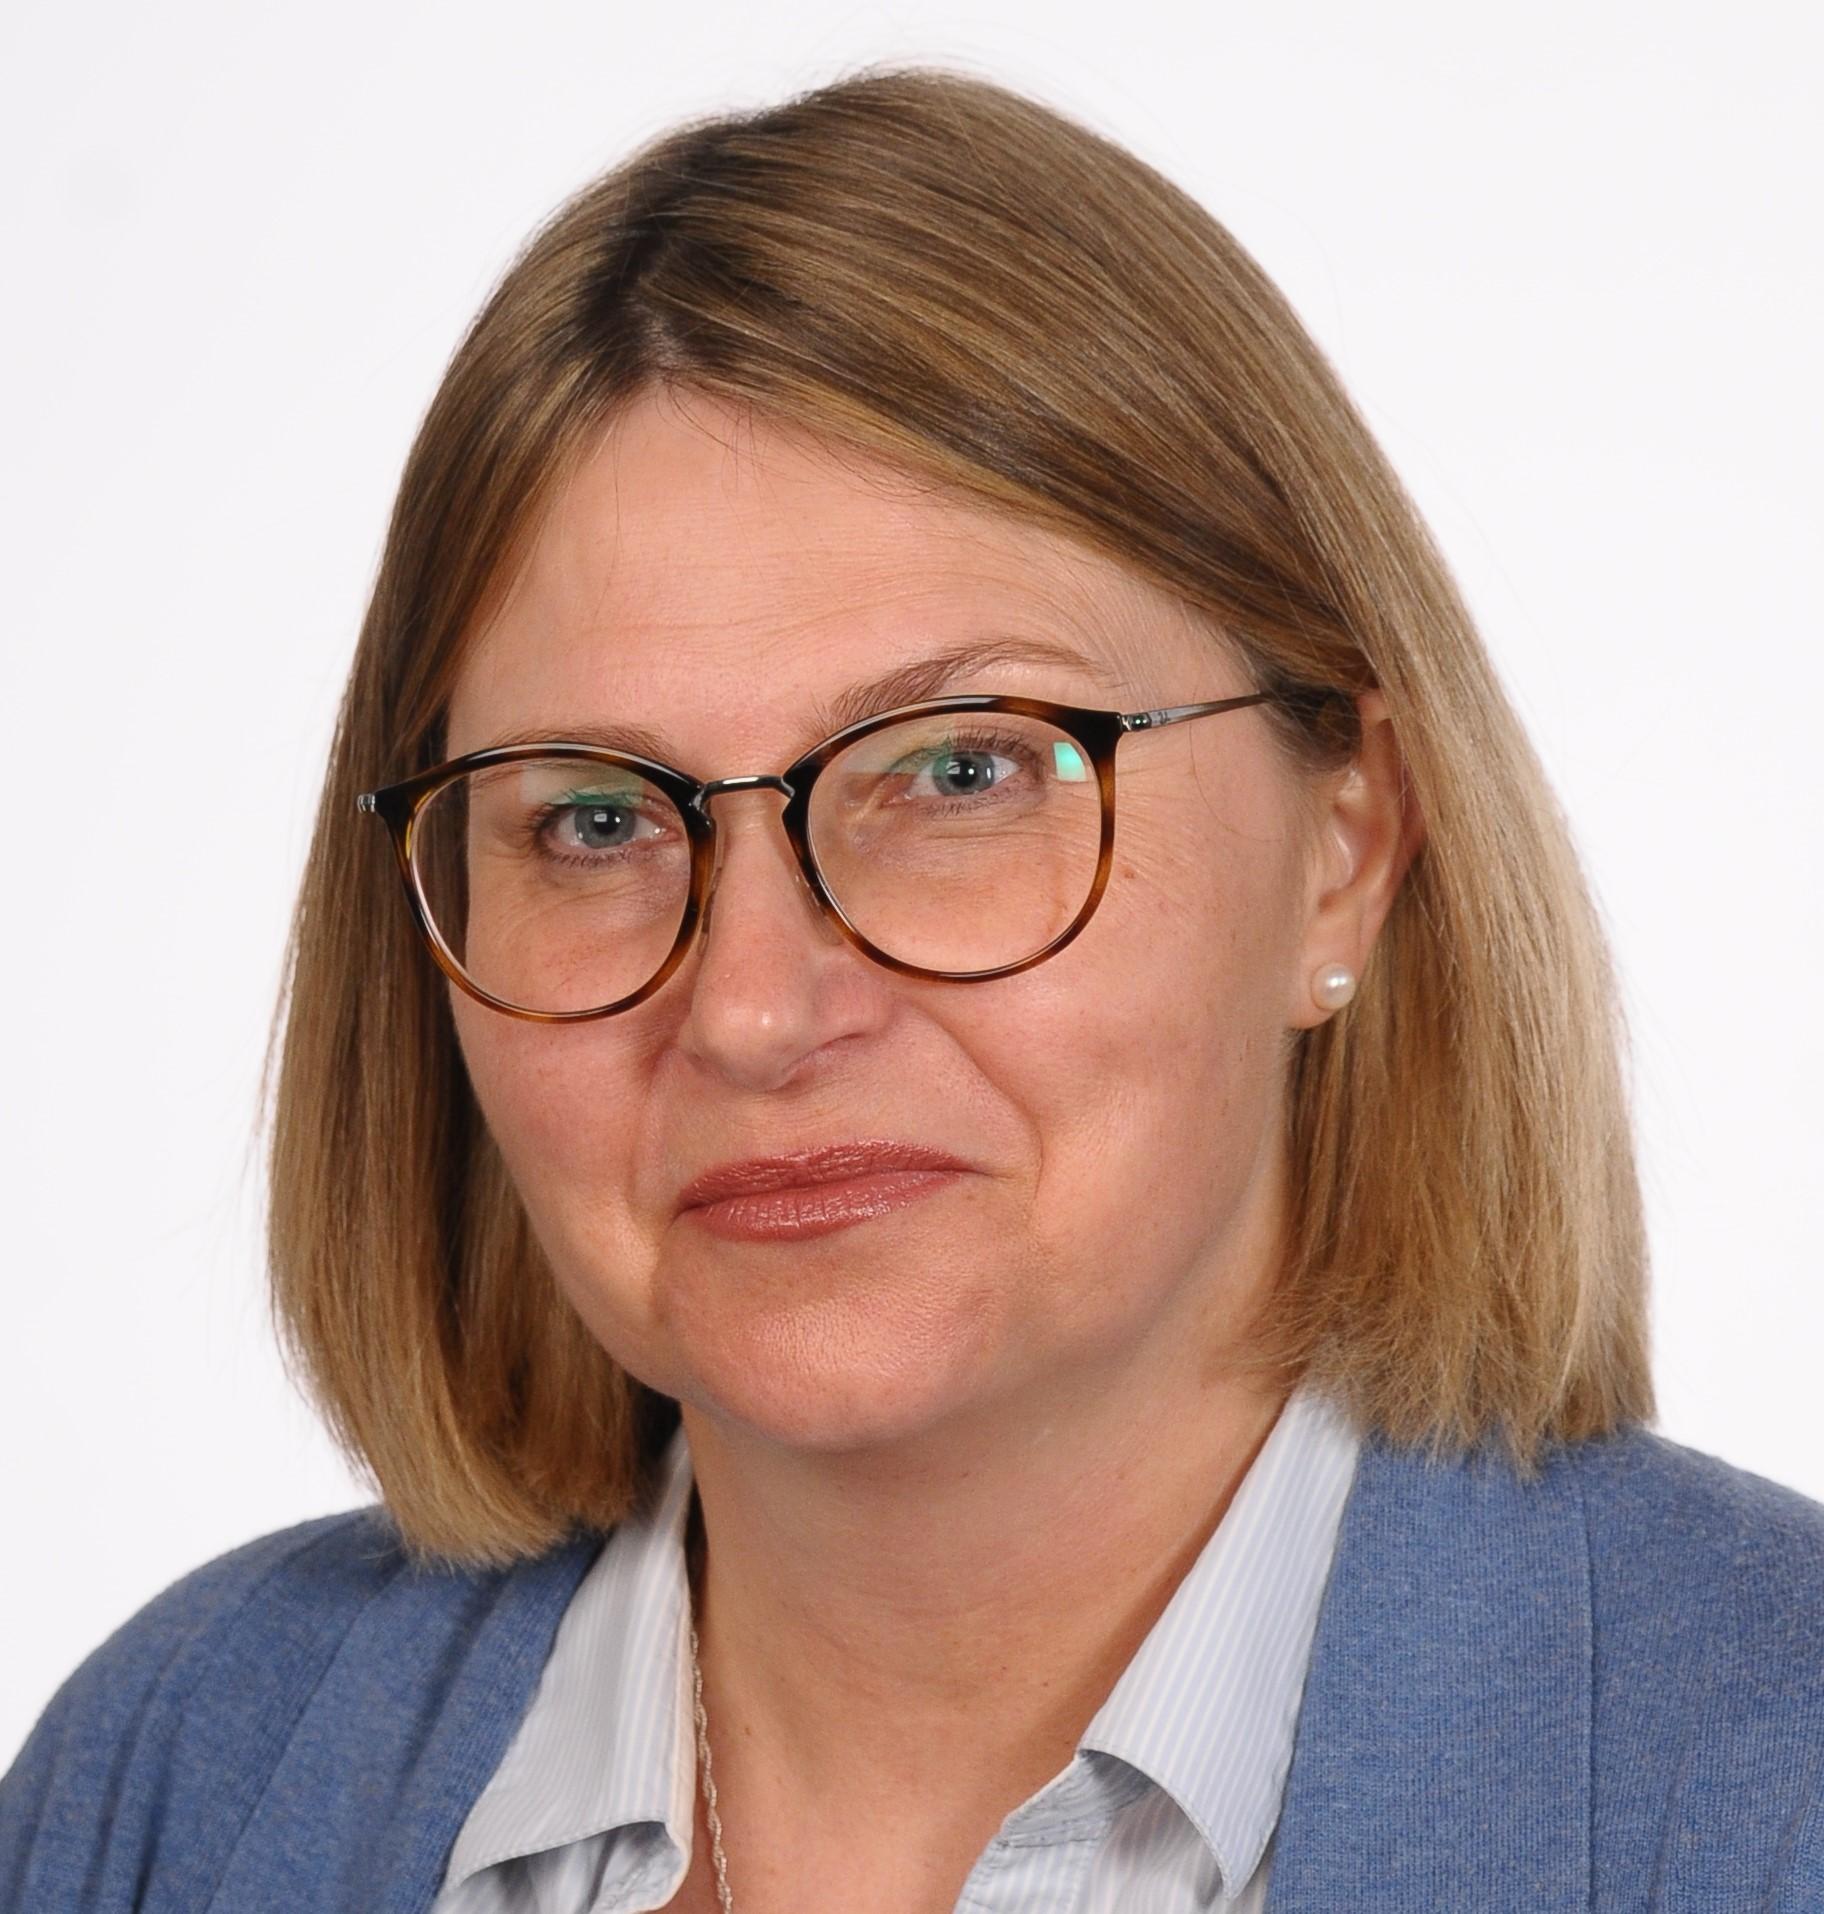 Ewa Mysłowska-Marczuk